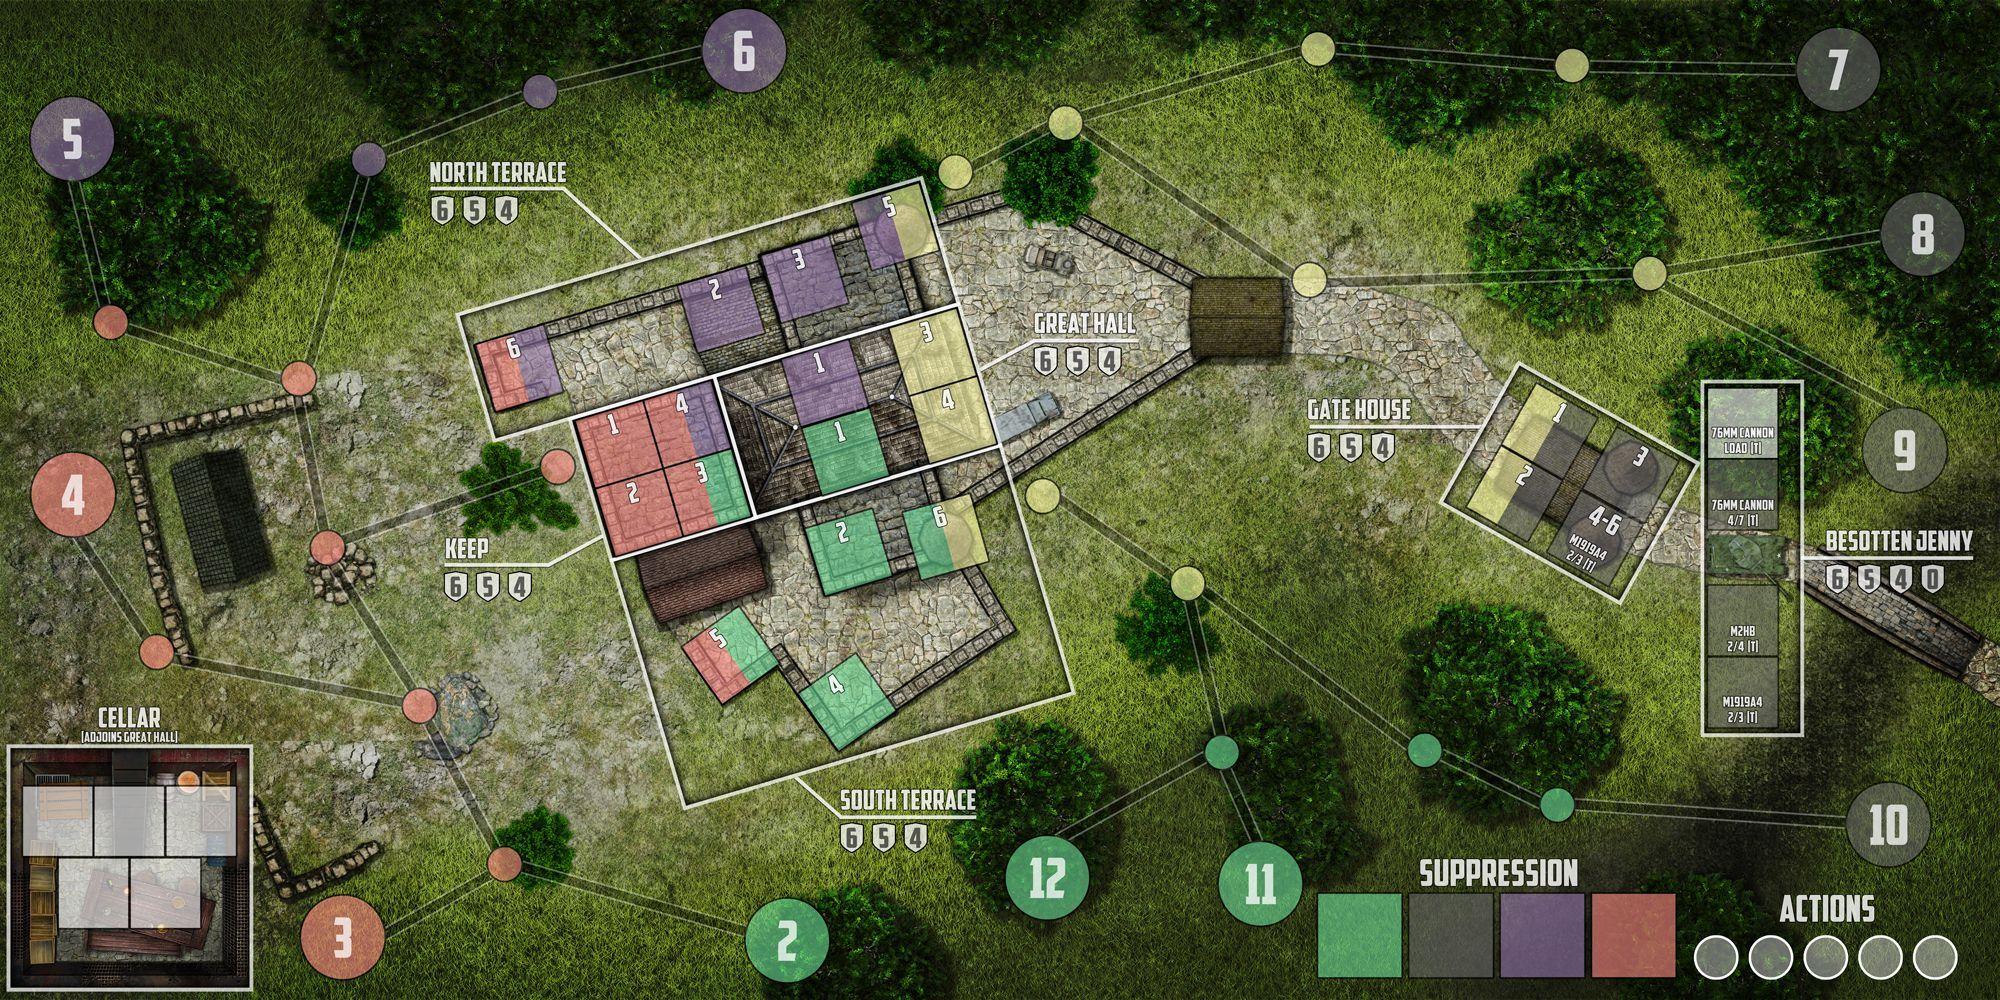 WiP] Castle Itter: the Strangest Battle of WW2 - 2015-16 Wargame Contest  (Contest Ready) | BoardGameGeek